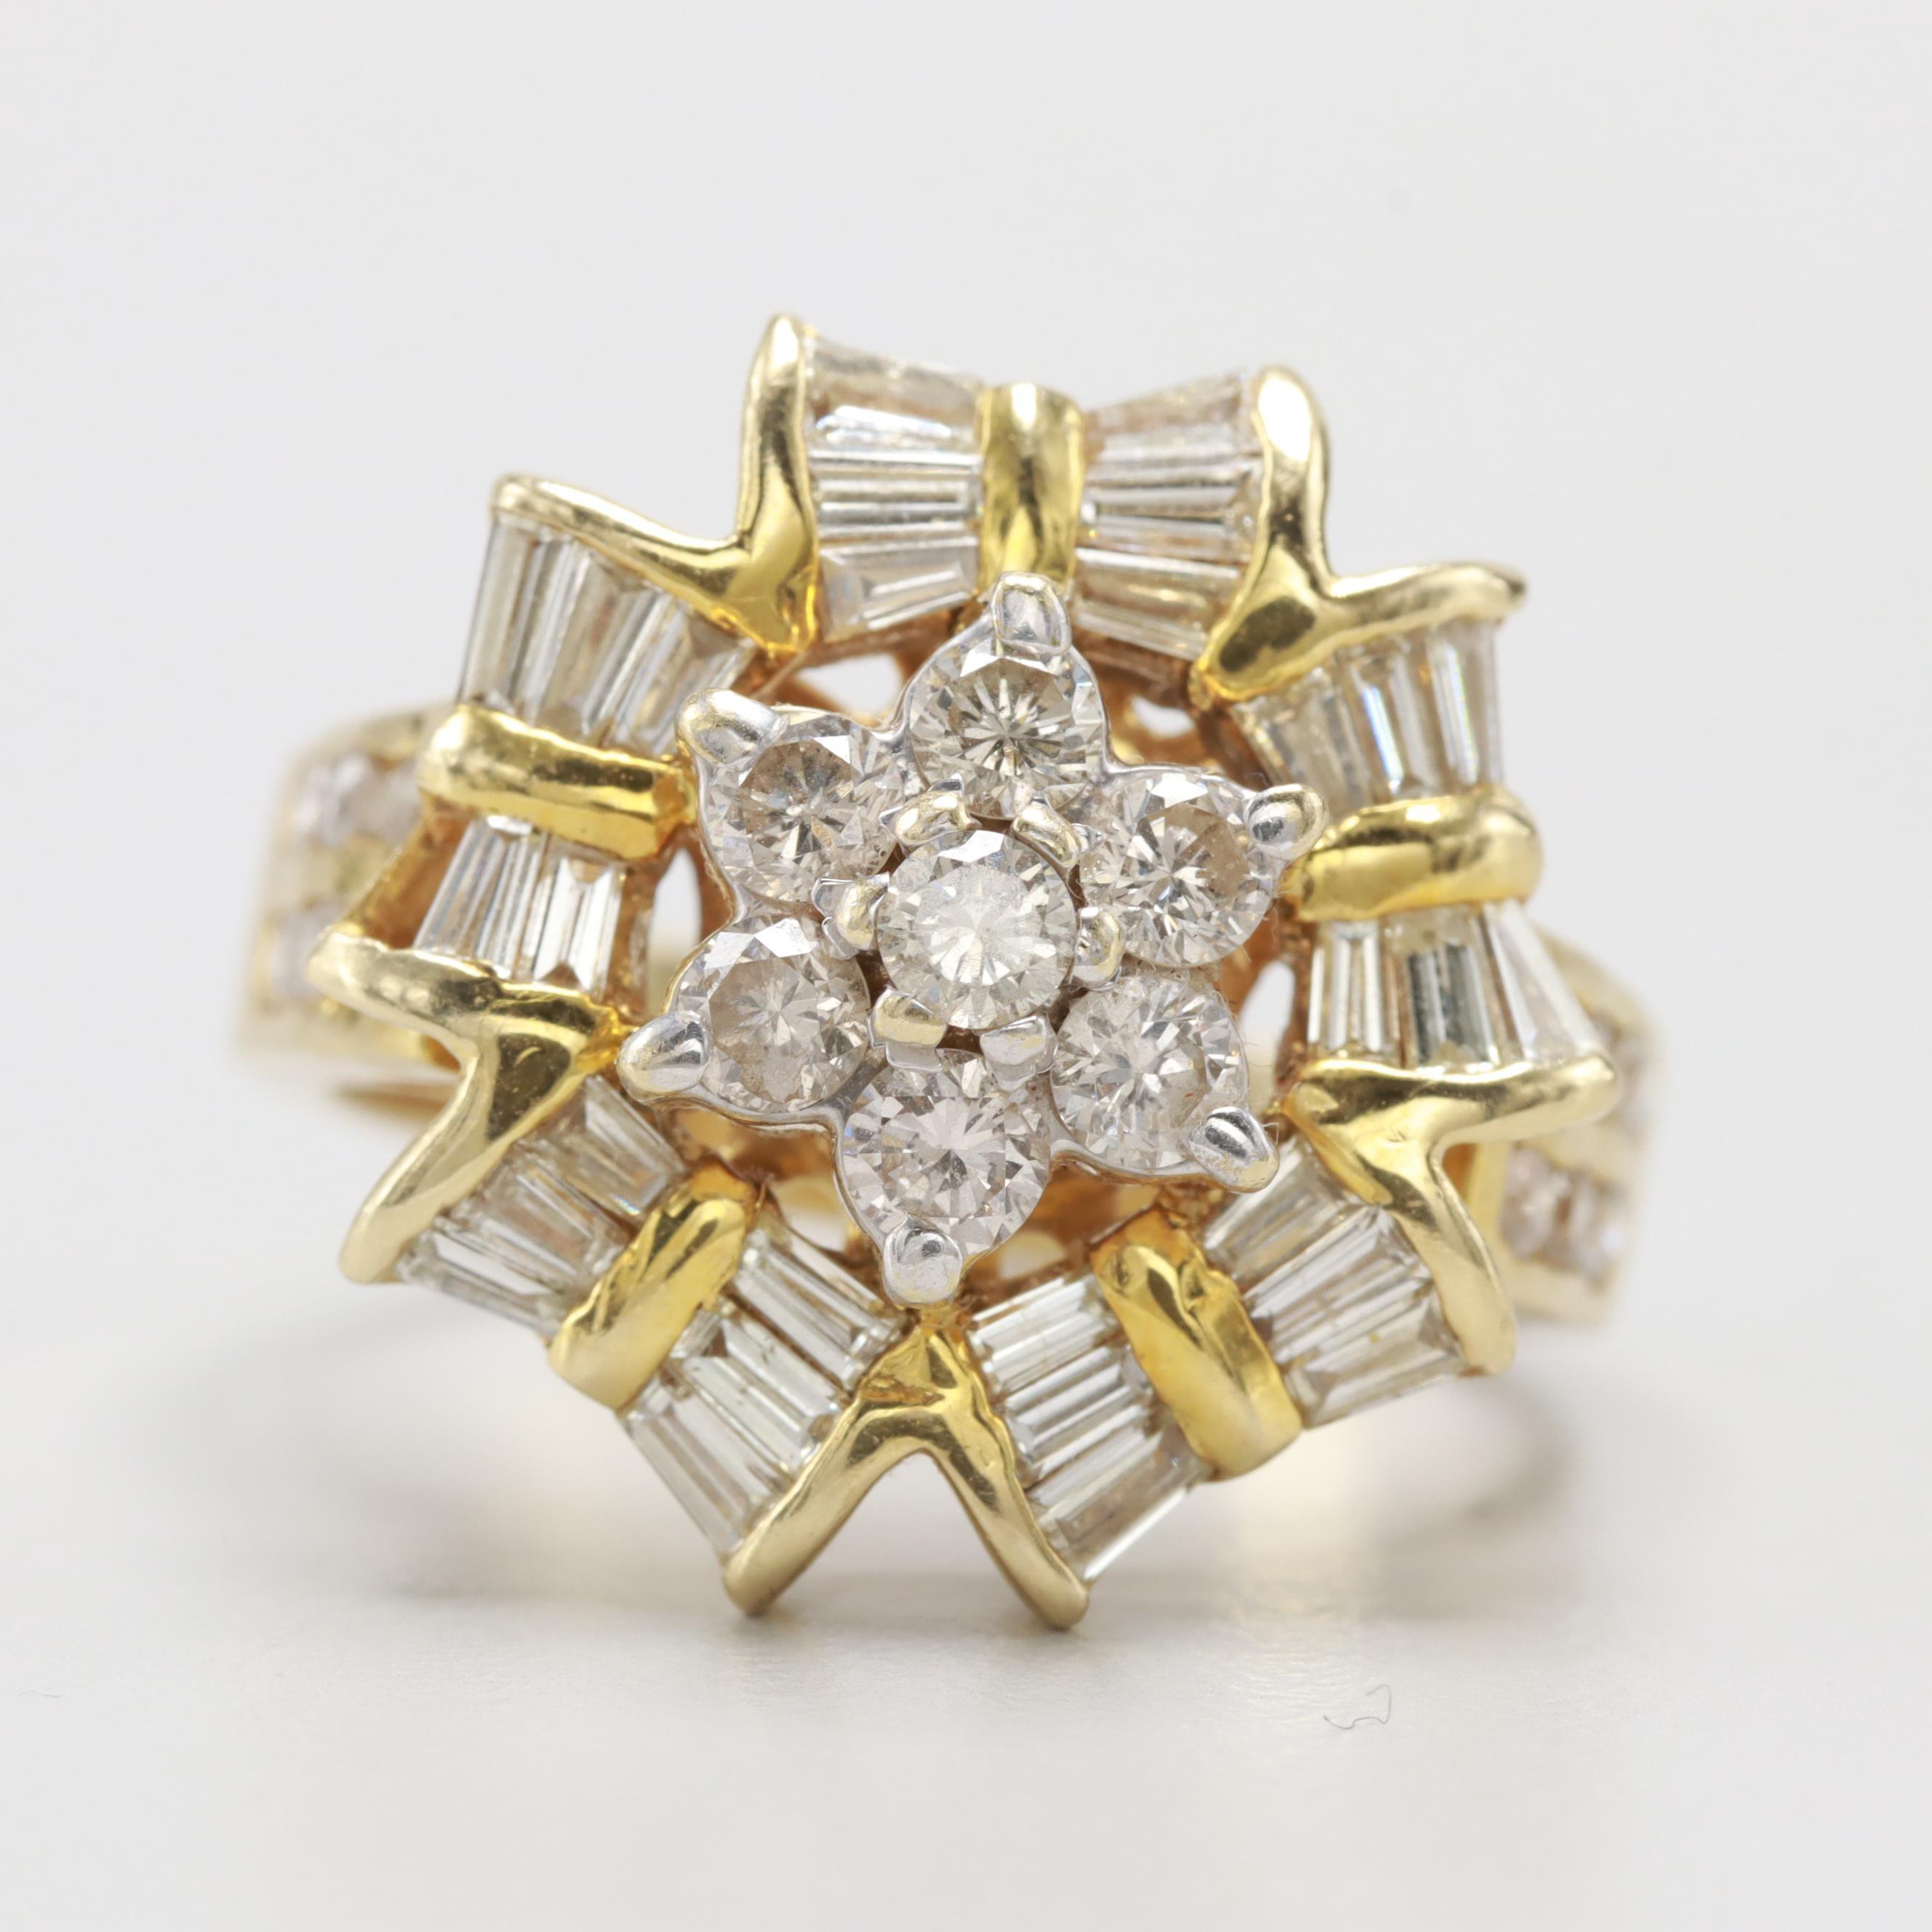 Circa 1950s 14K Yellow Gold 1.23 CTW Diamond Cluster Ring